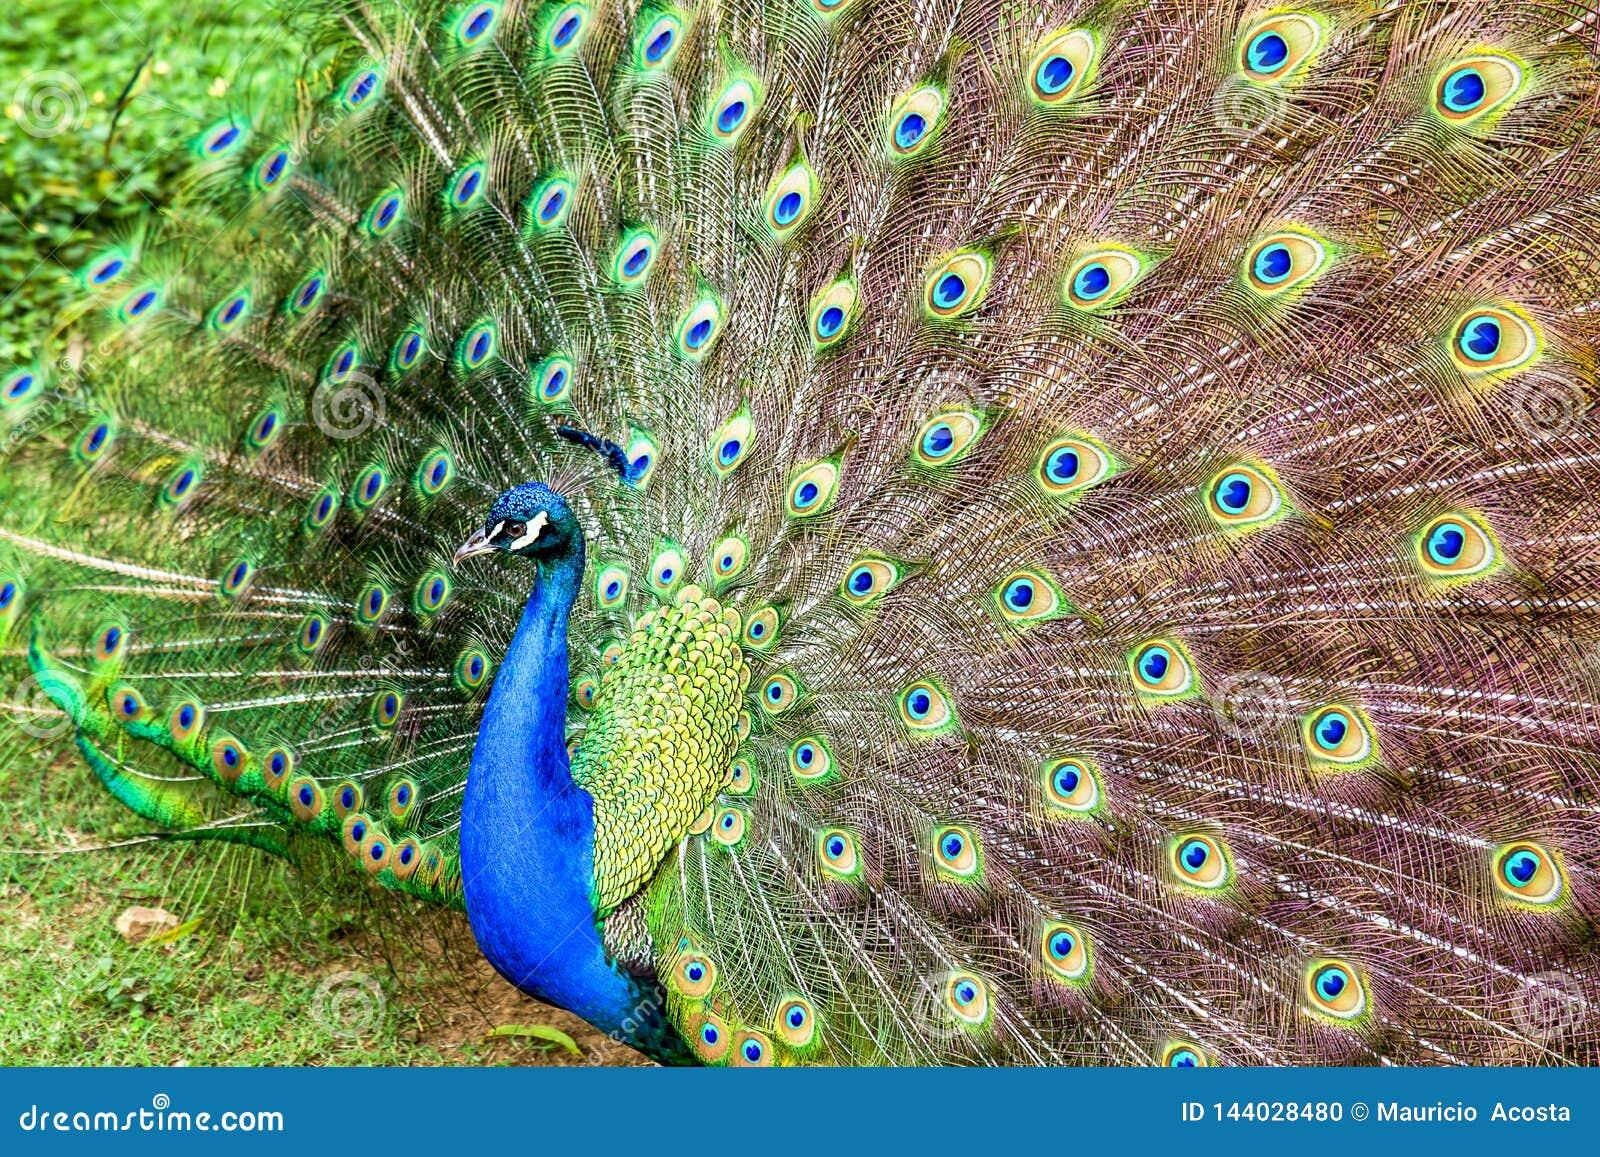 Les yeux multiples de plumes de queue de l apeacock